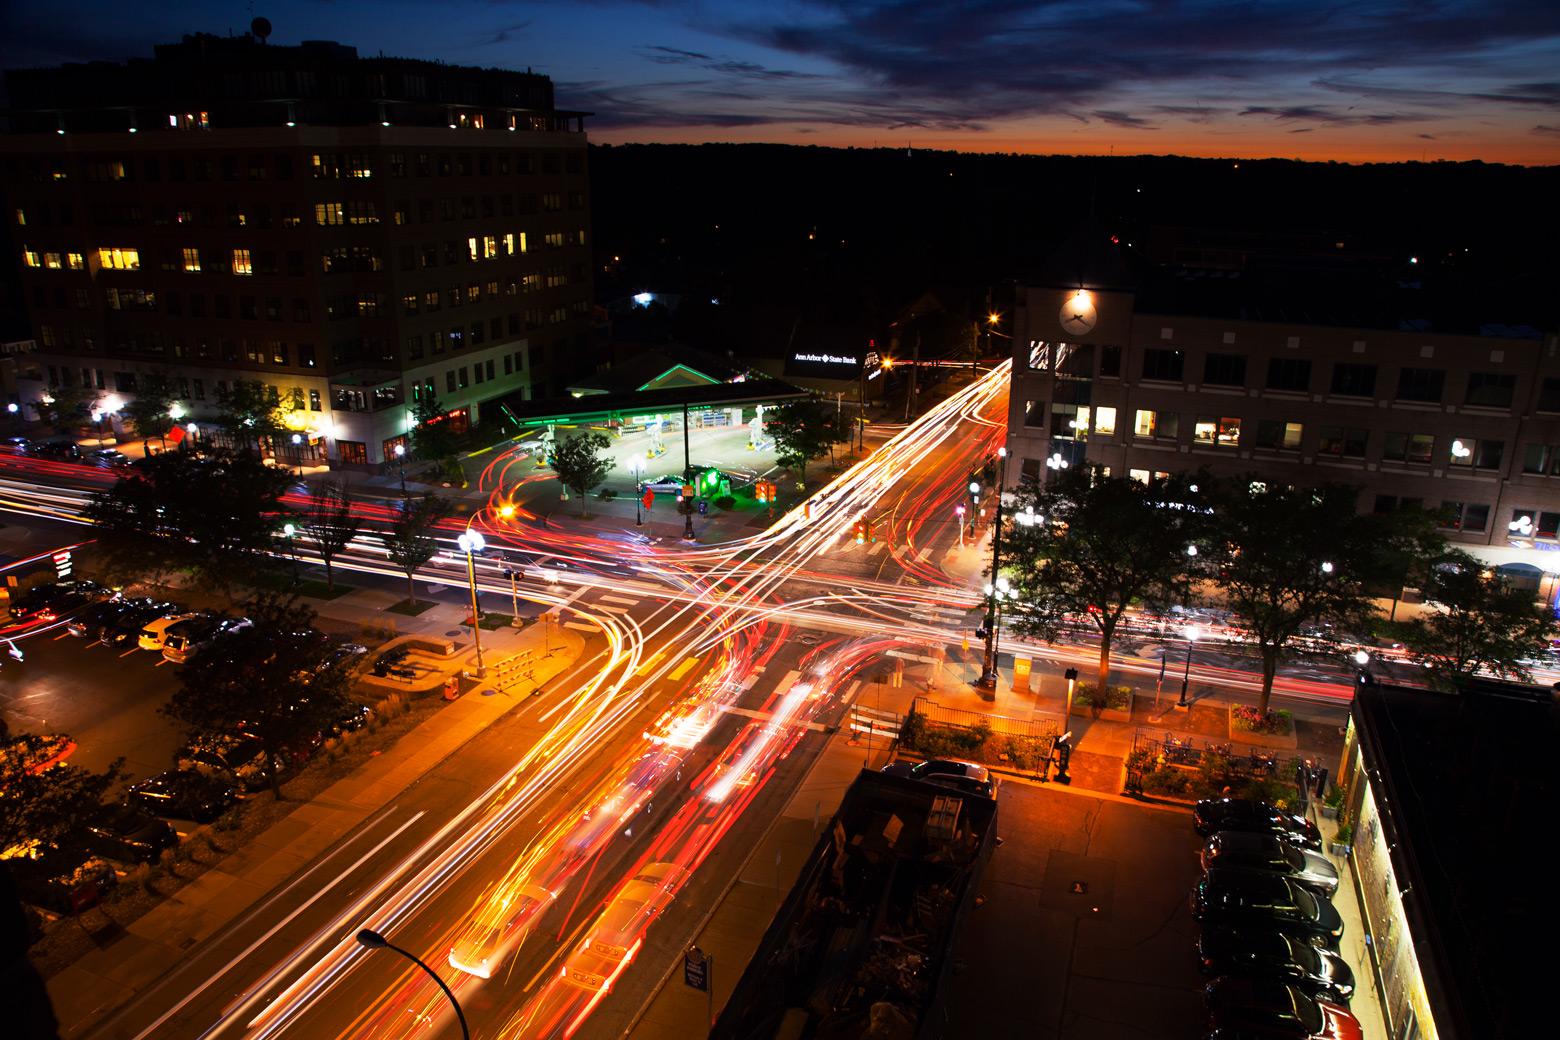 Ann Arbor intersection